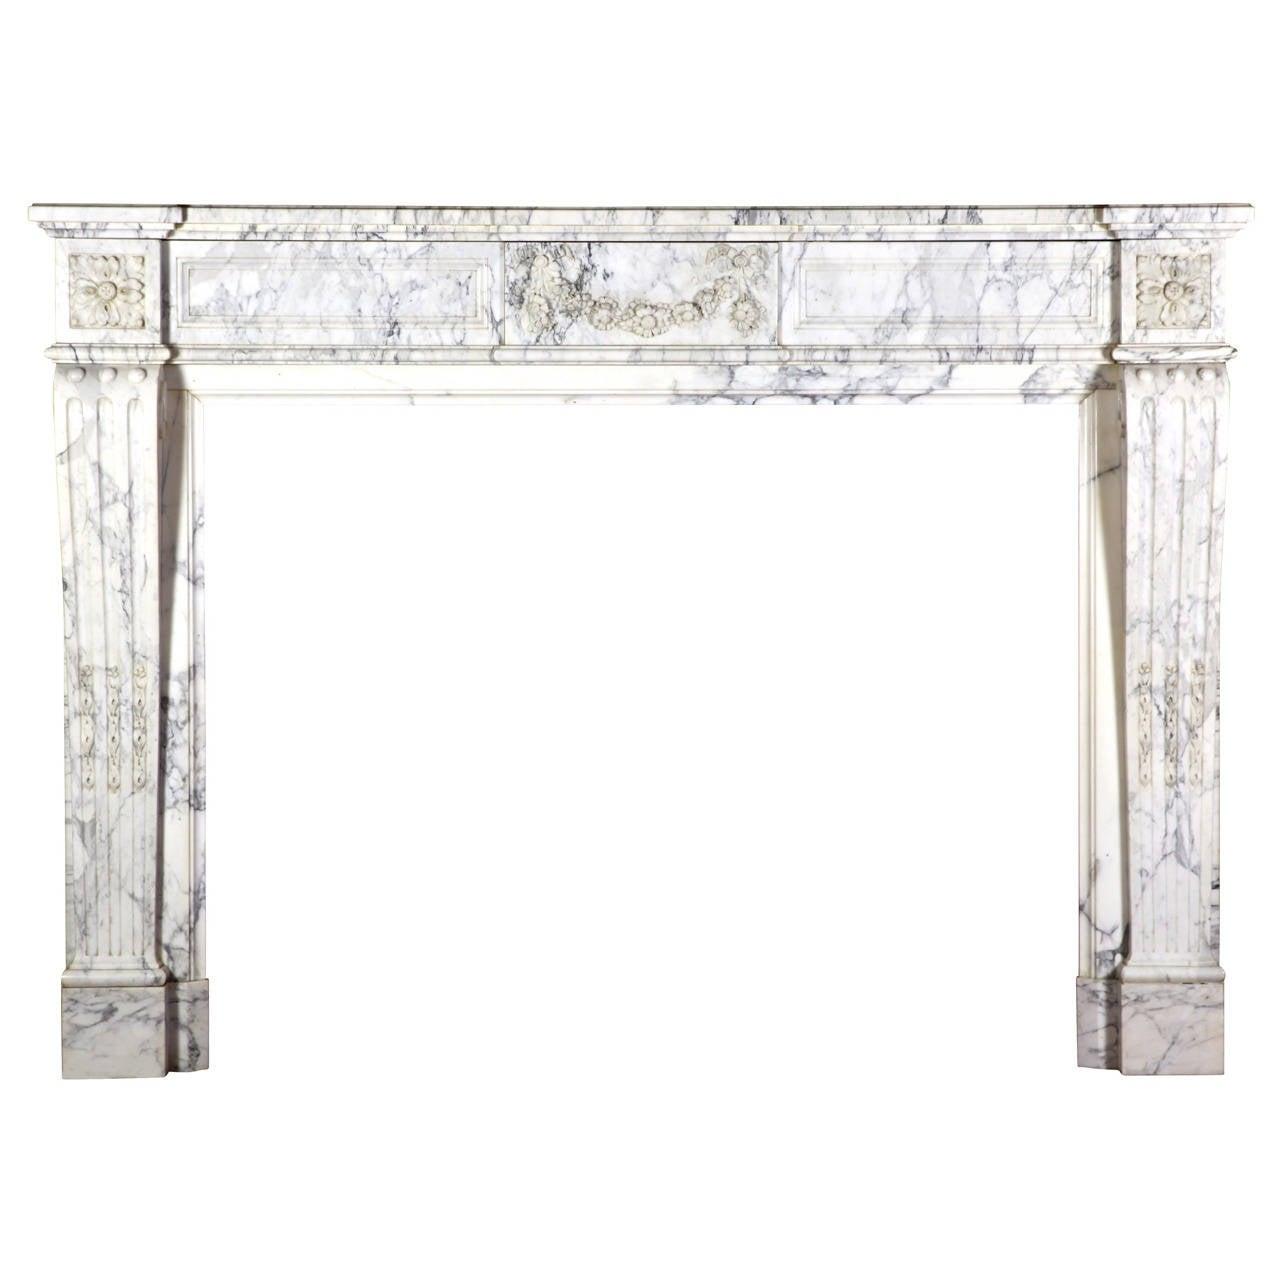 19th C. Blanc de Carrara Marble Antique Fireplace Mantel with Flower Garland